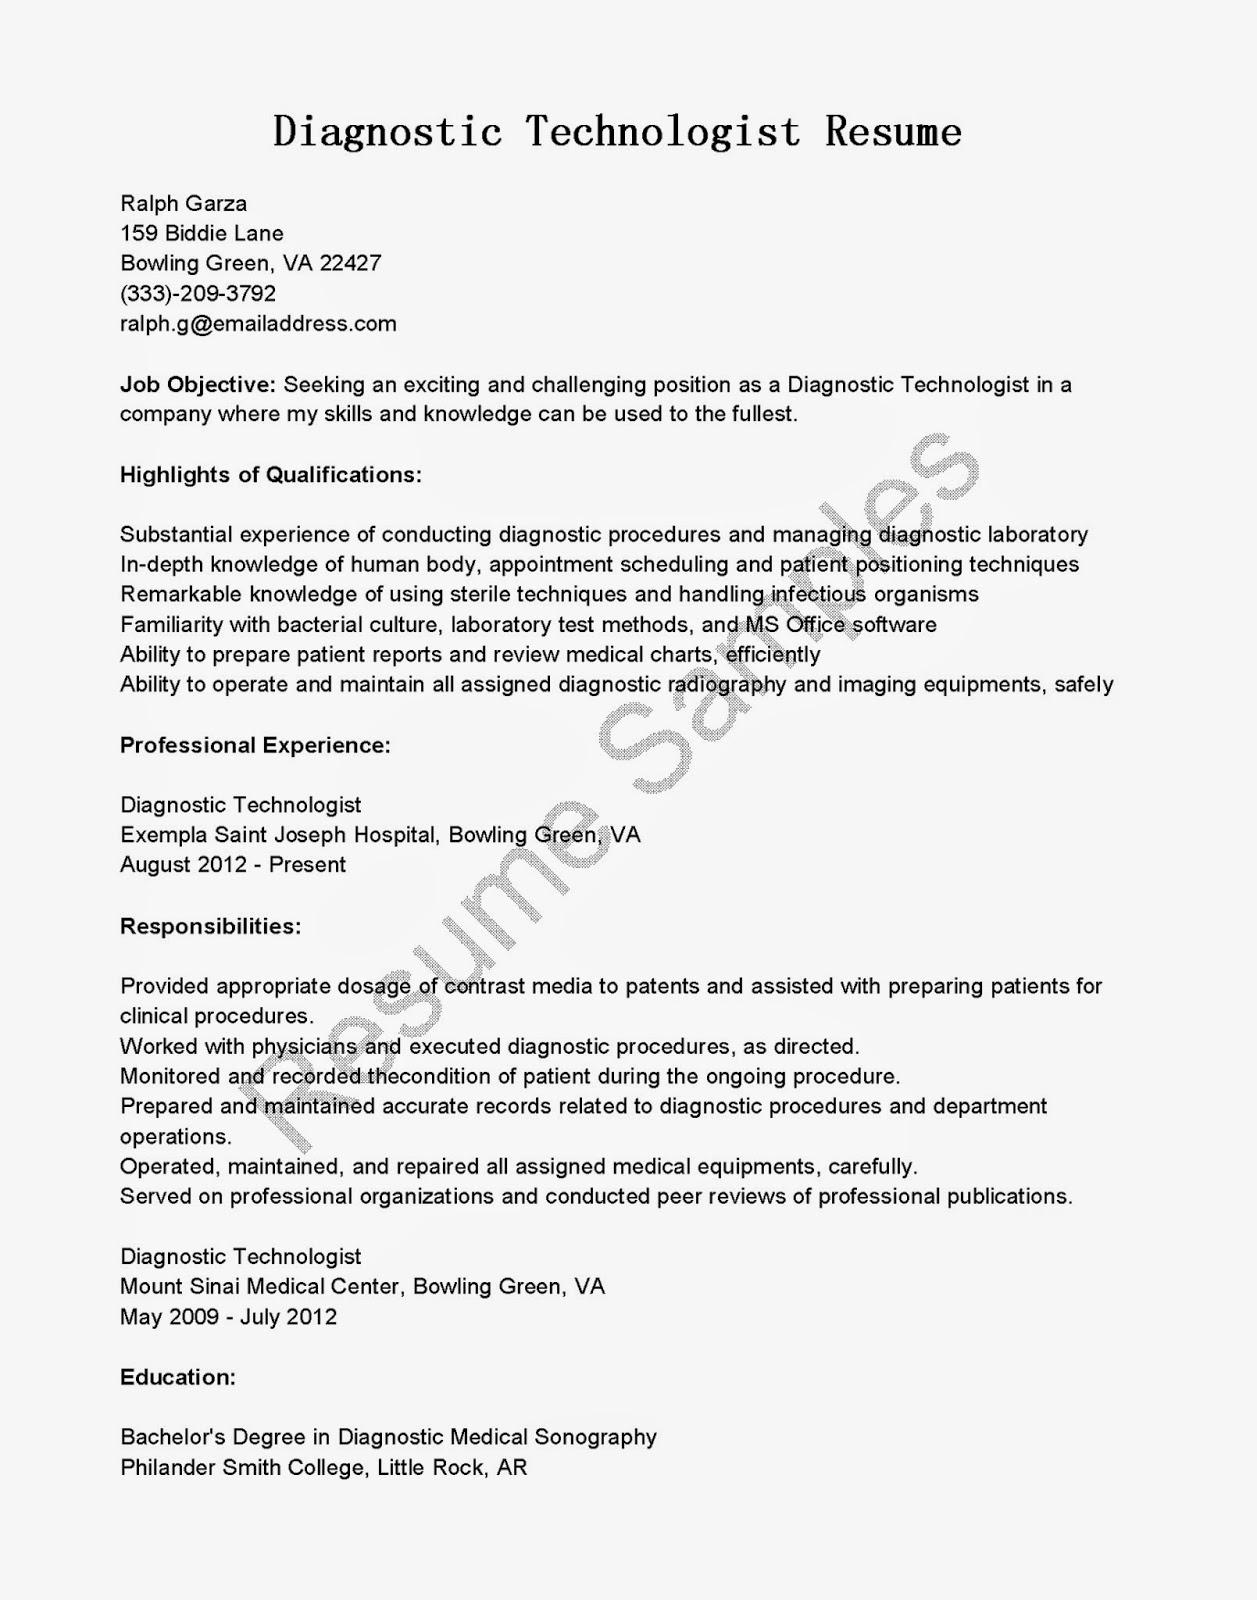 resume samples  diagnostic technologist resume sample